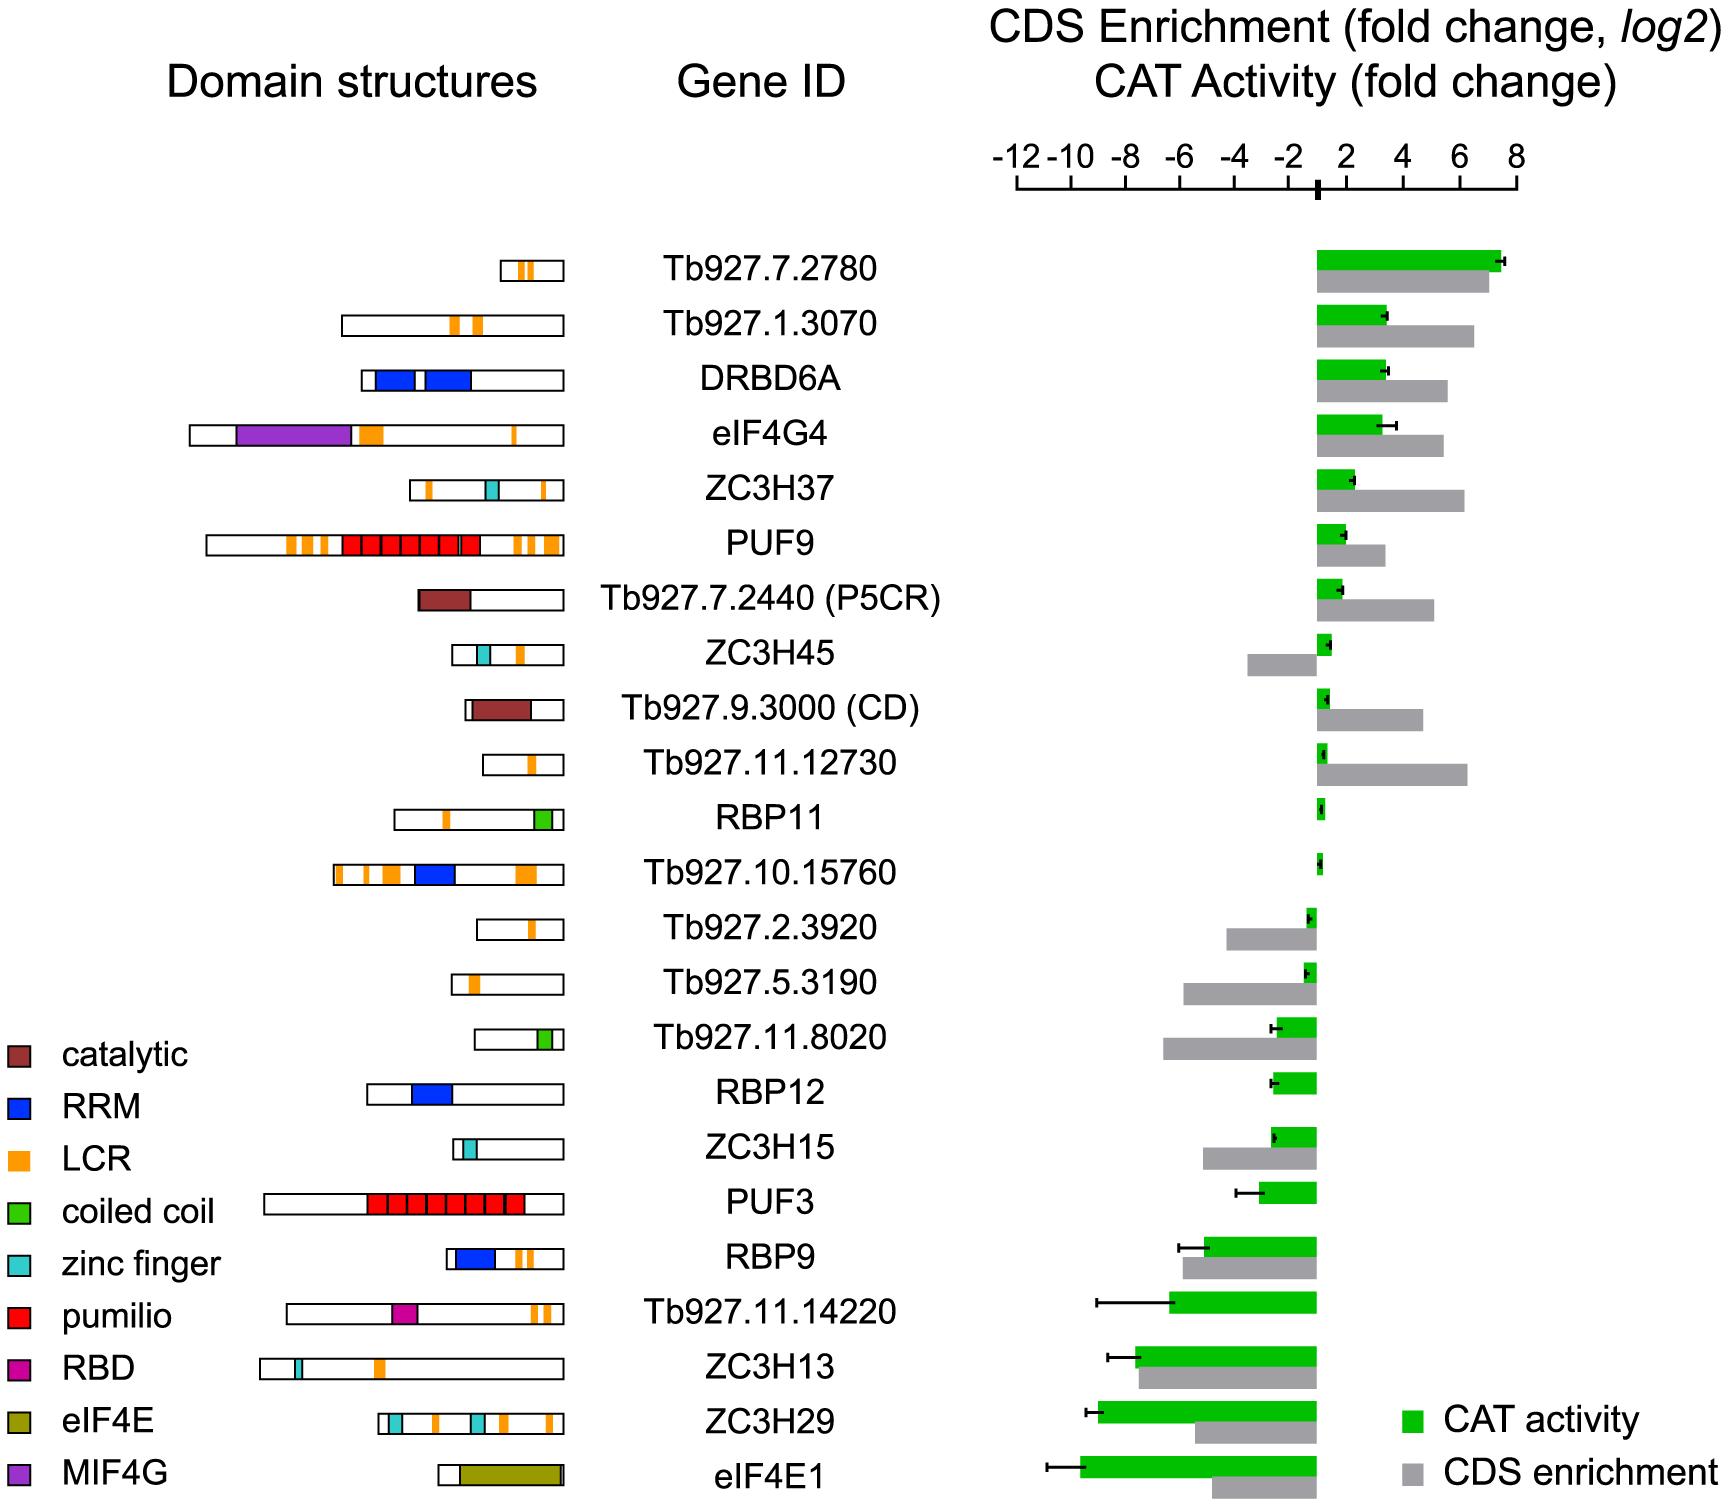 Validation of mRNA-fate regulators.